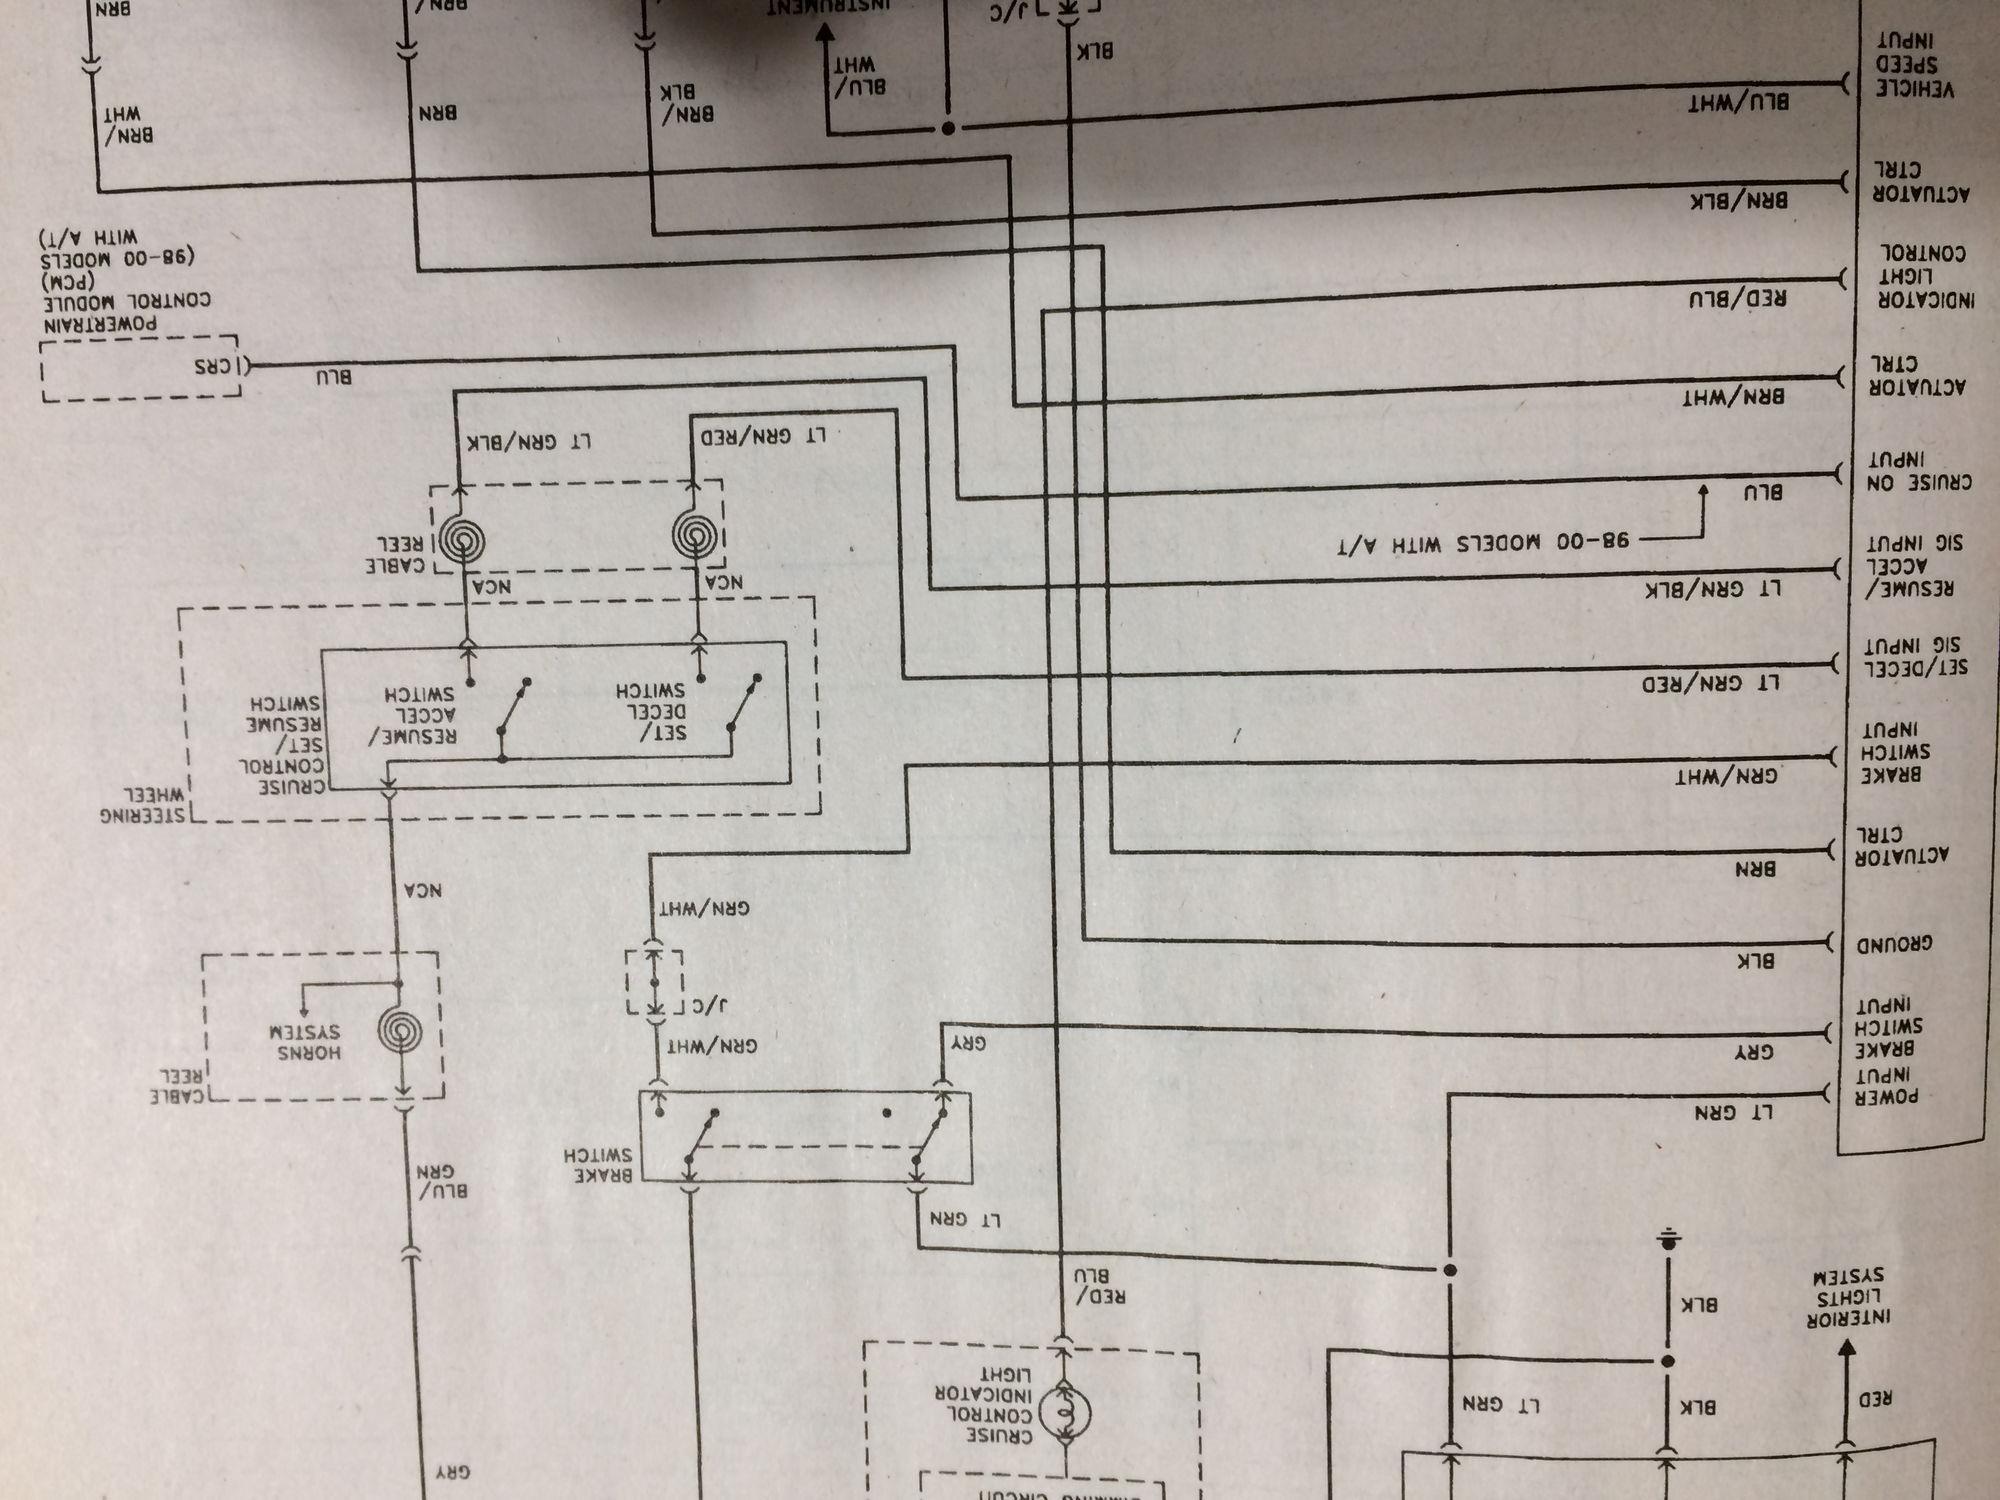 Electrical Wiring Diagram On Wiring Diagram 2000 Crv Cruise Control